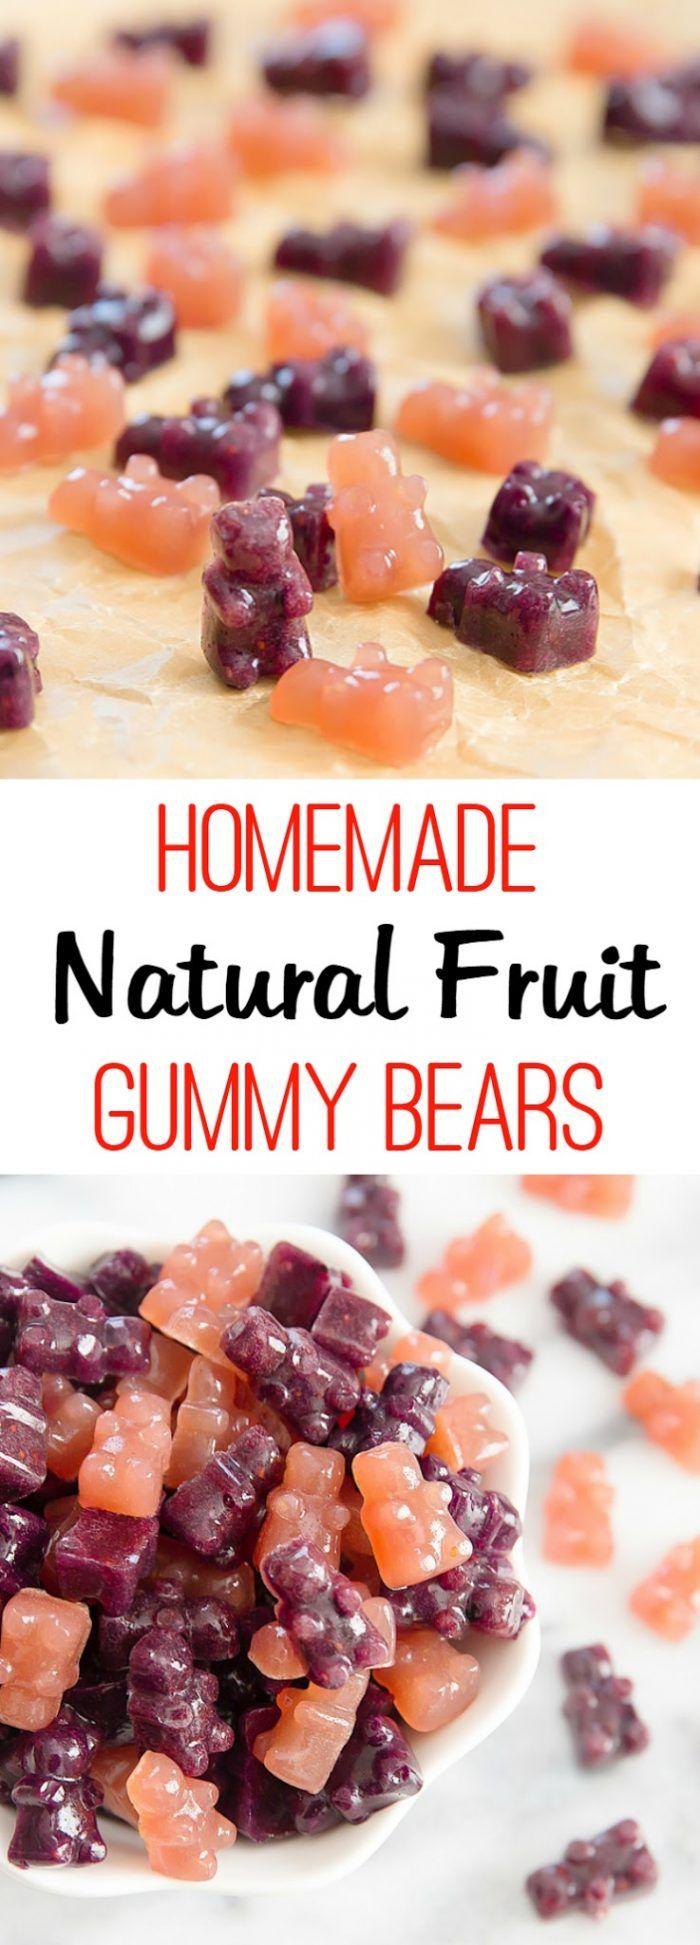 Homemade Gummy Bears - Kirbie's Cravings